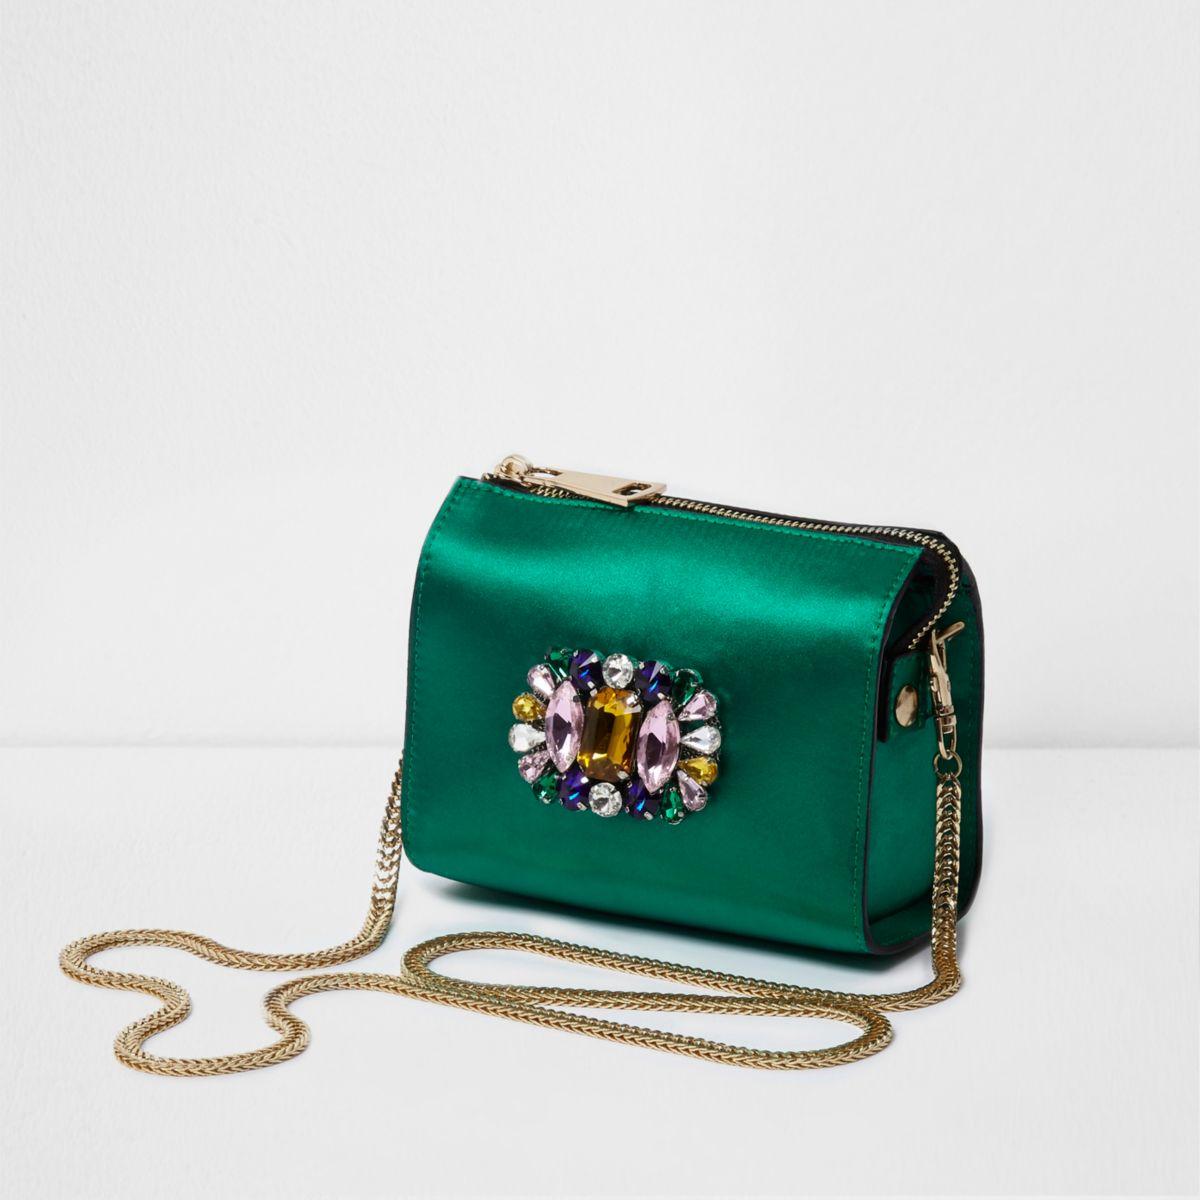 Green satin embellished chain cross body bag